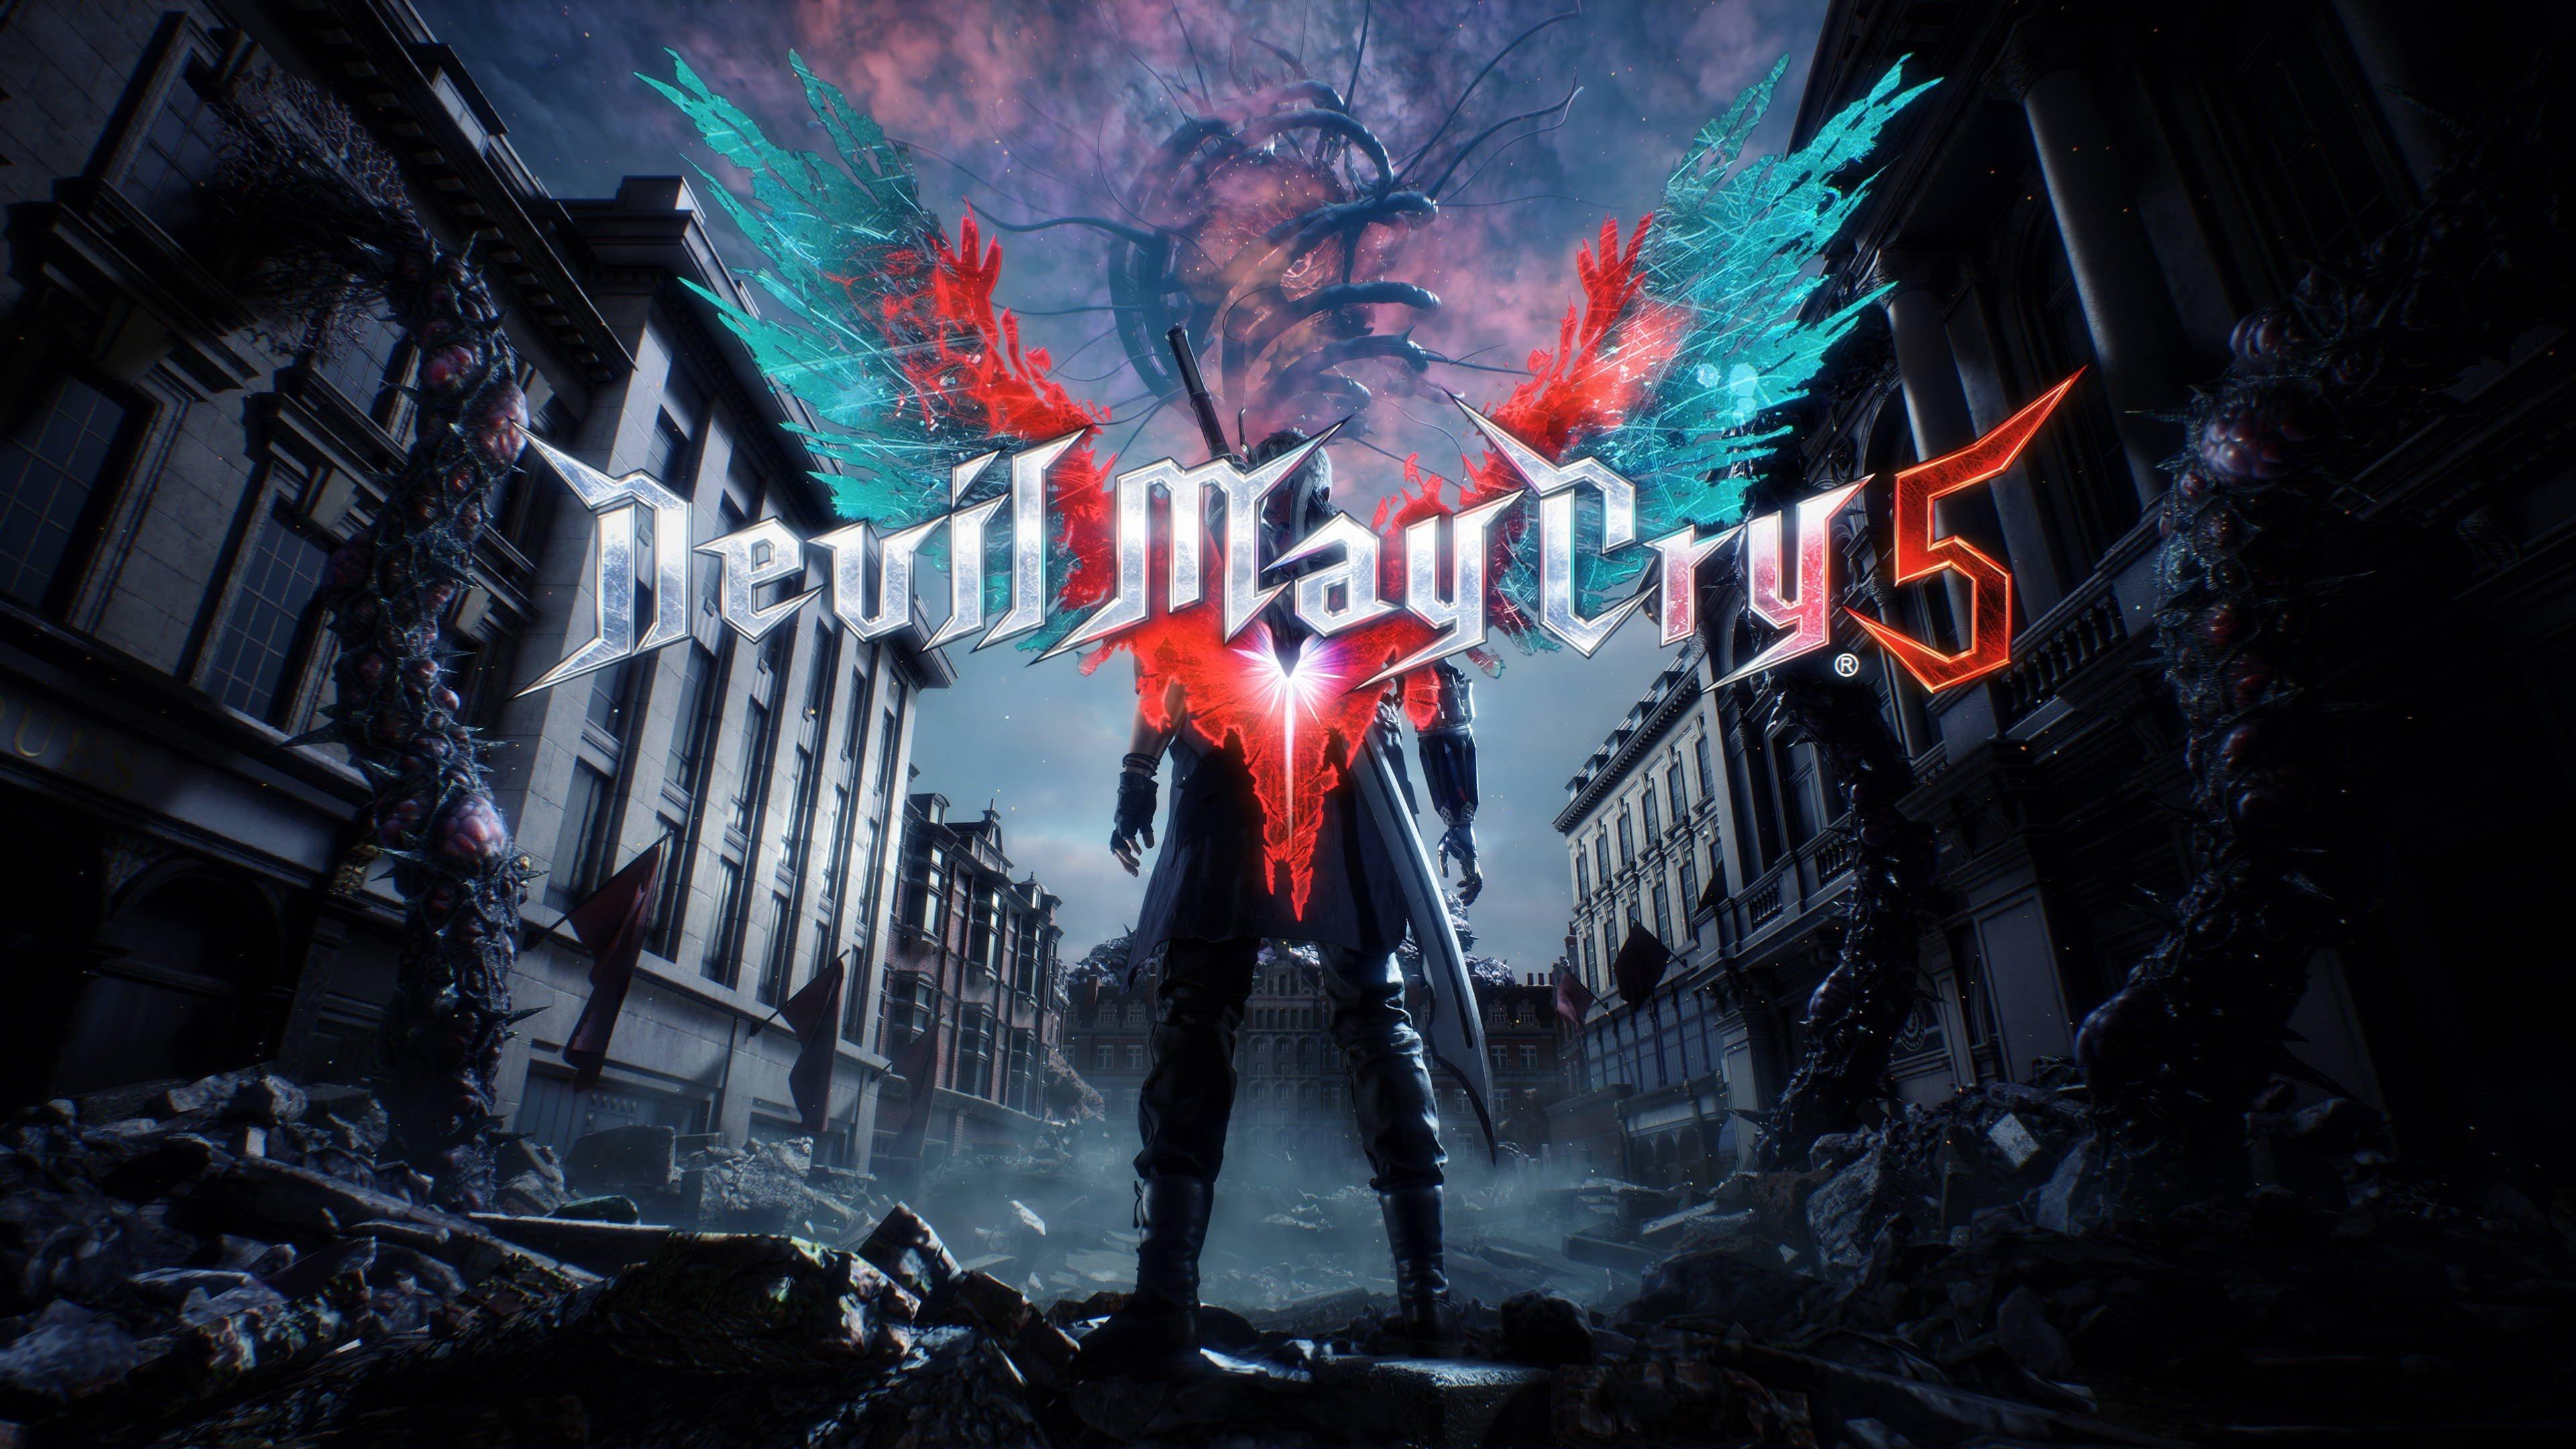 Fondos de pantalla Devil May Cry 5